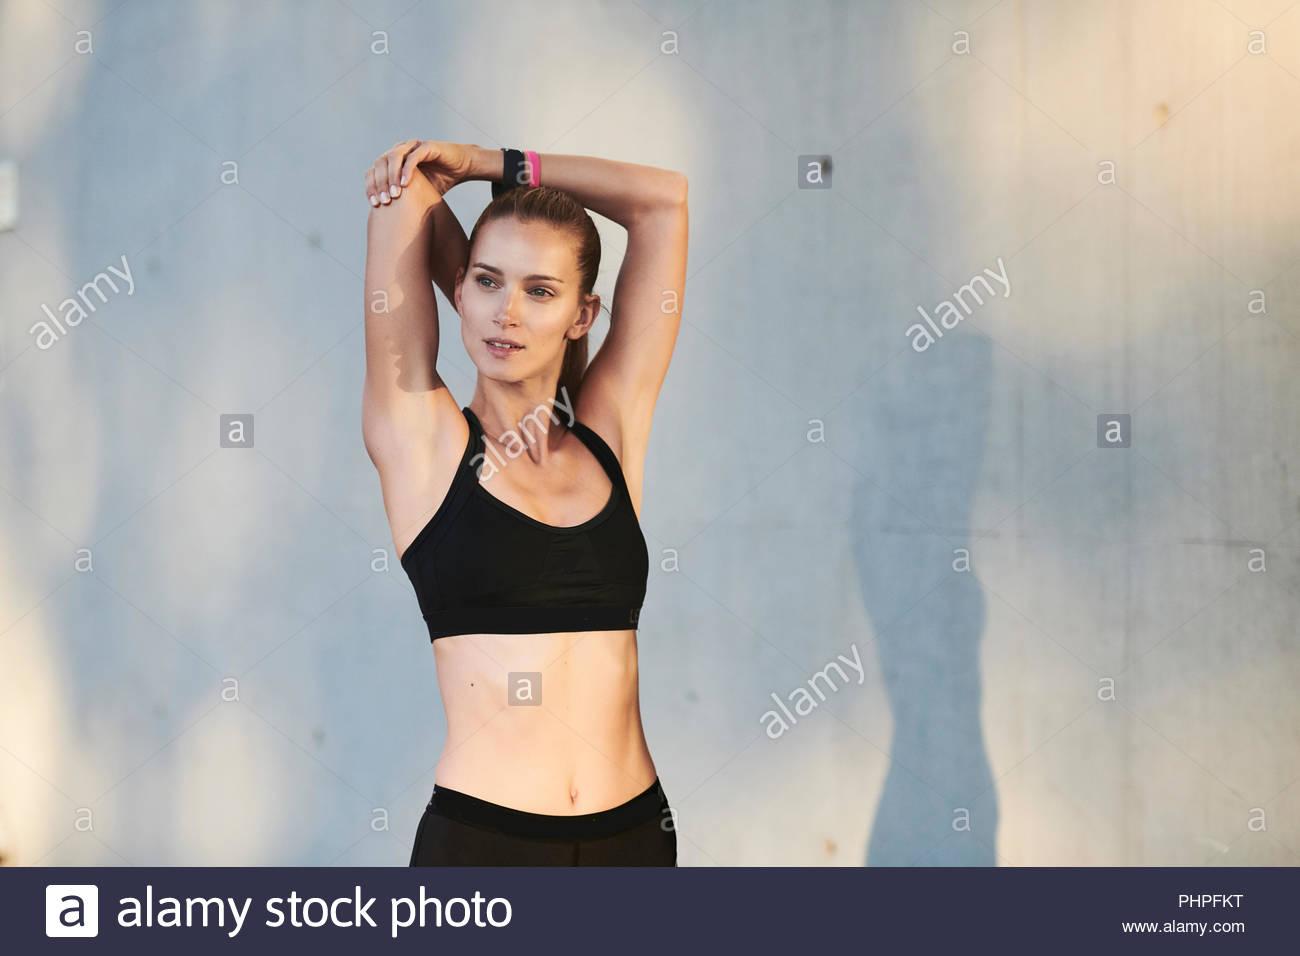 Woman wearing sports bra stretching - Stock Image